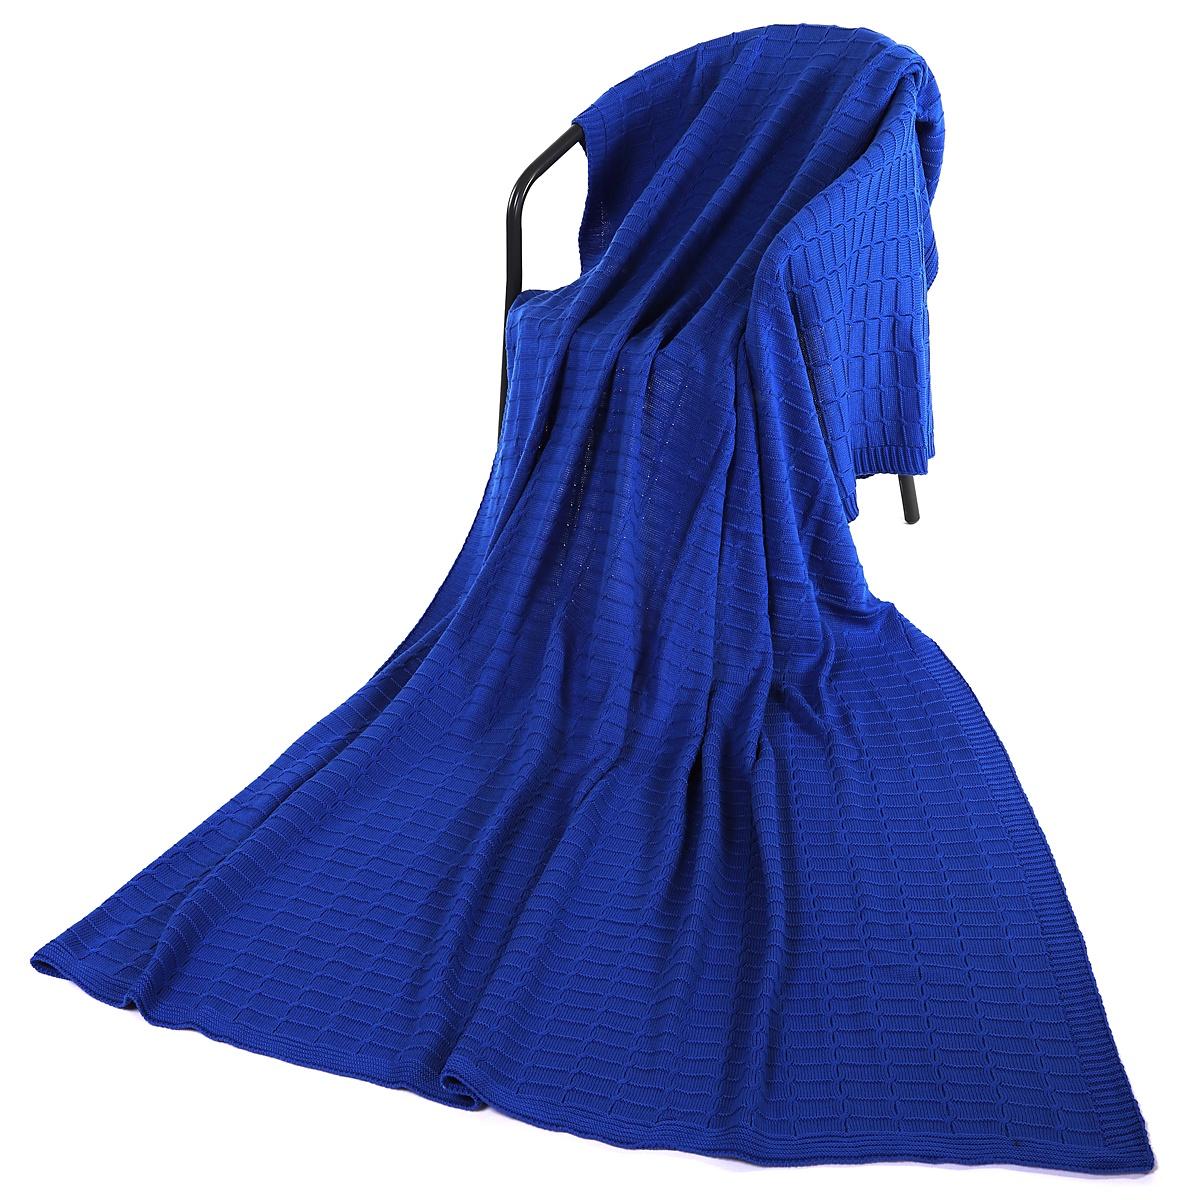 Плед ANRI АНРИ-П-4160х220079-160х220, синий